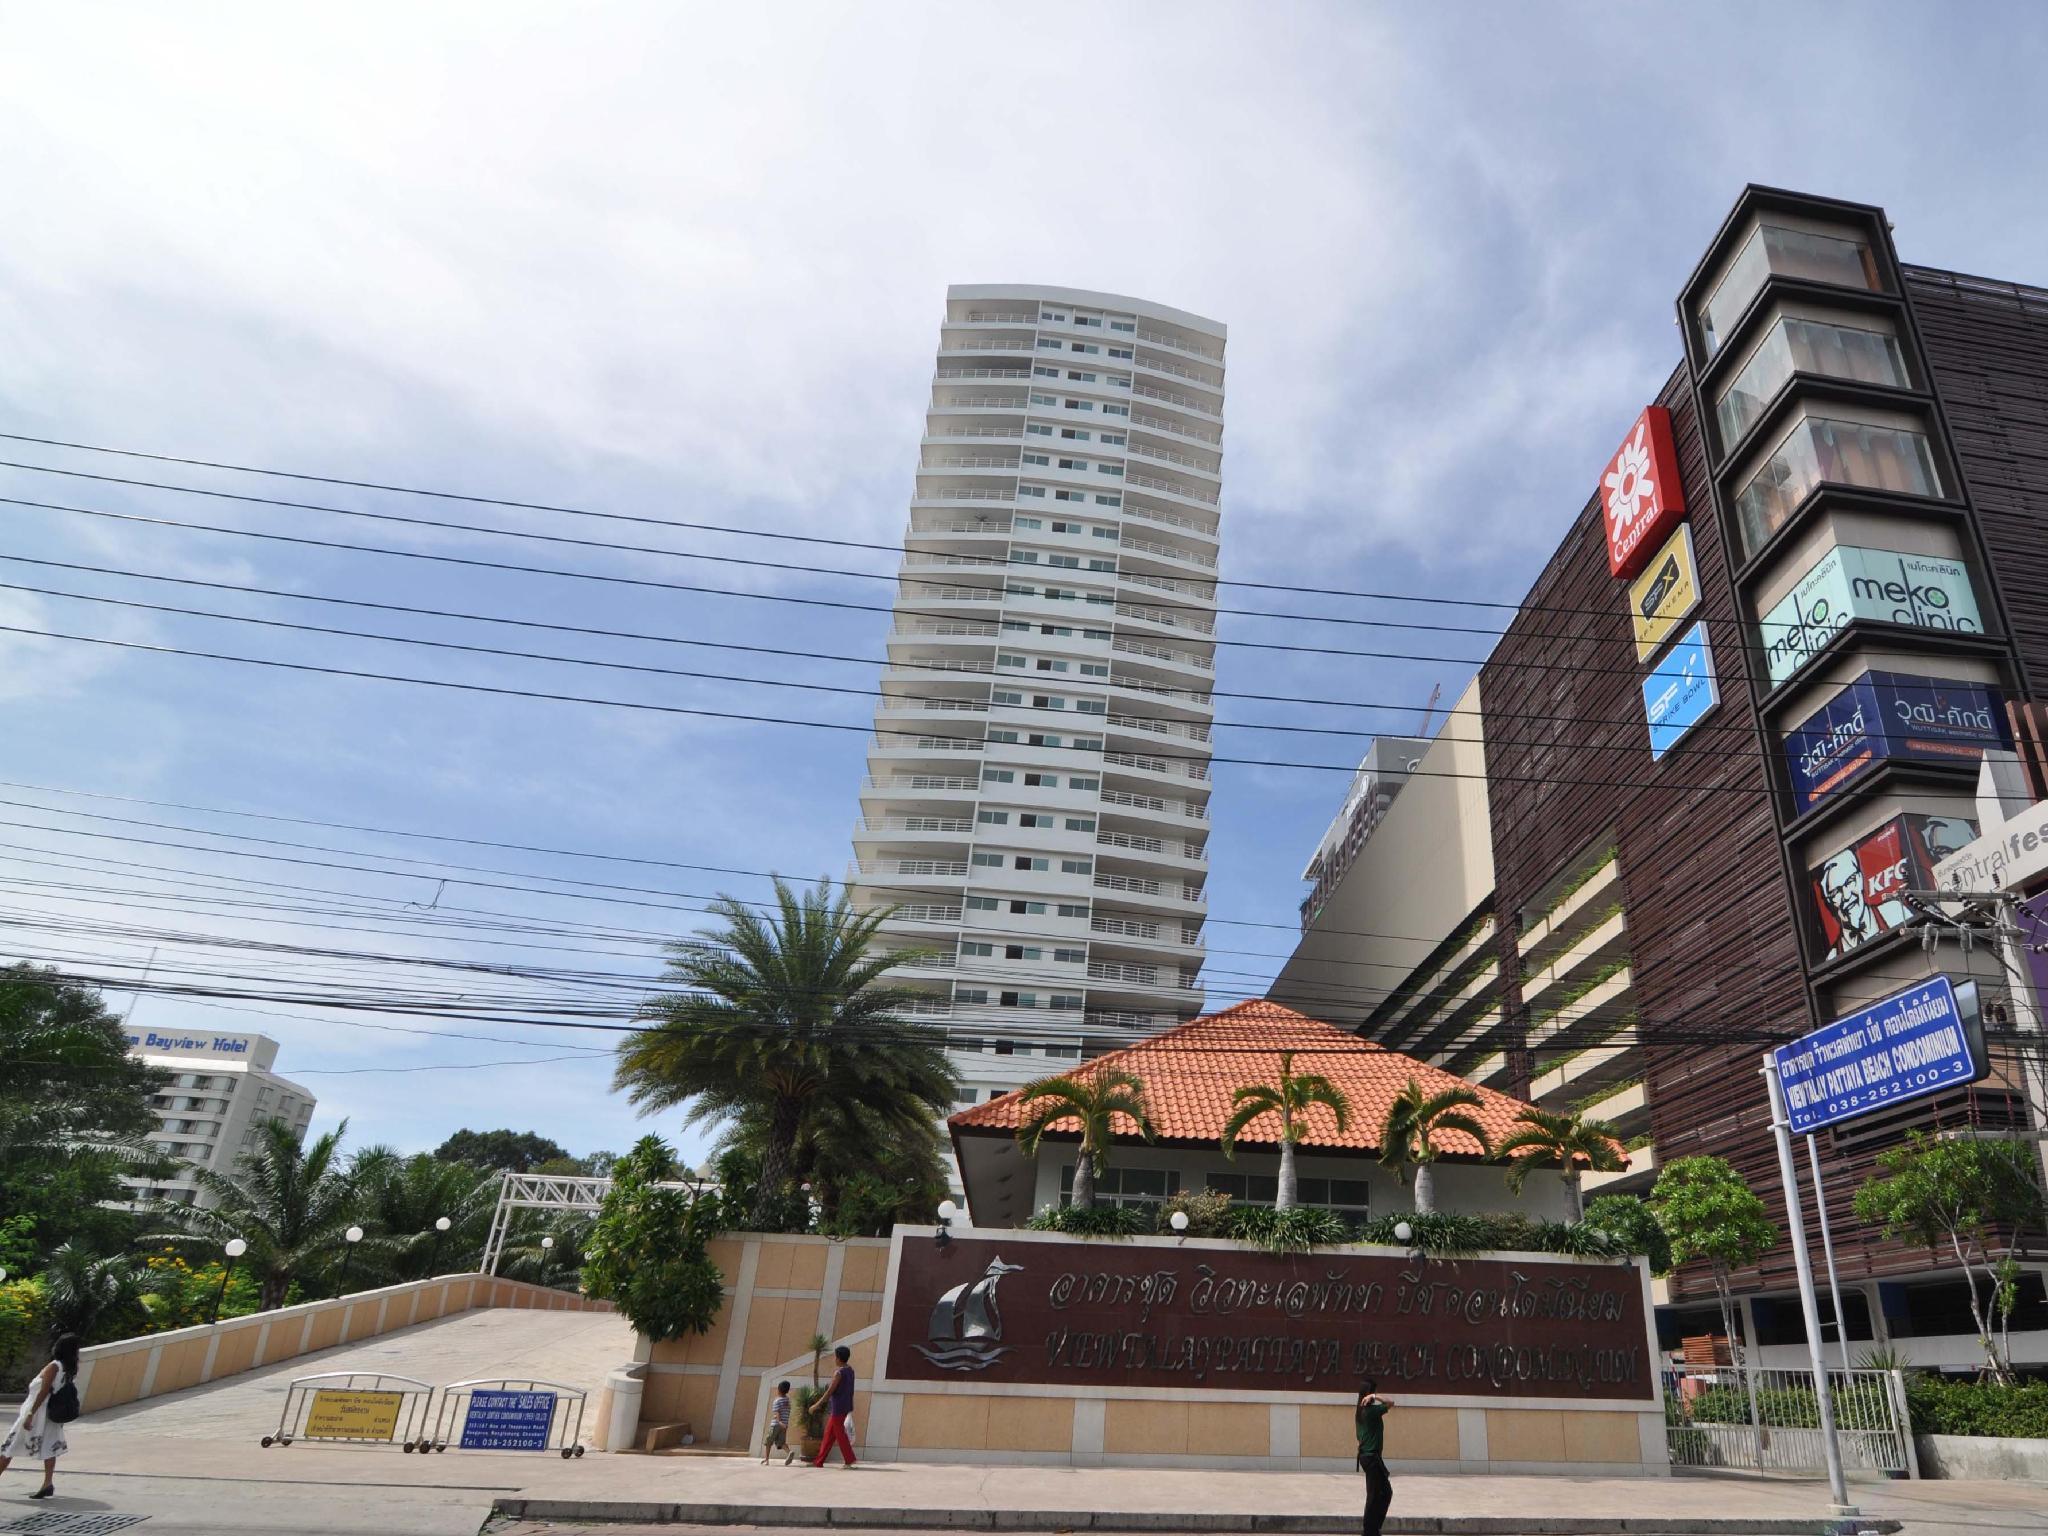 View Talay 6 Pattaya Beach Condominium by Honey วิว ทะเล 6 พัทยา บีช คอนโดมิเนี่ยม บาย ฮันนี่